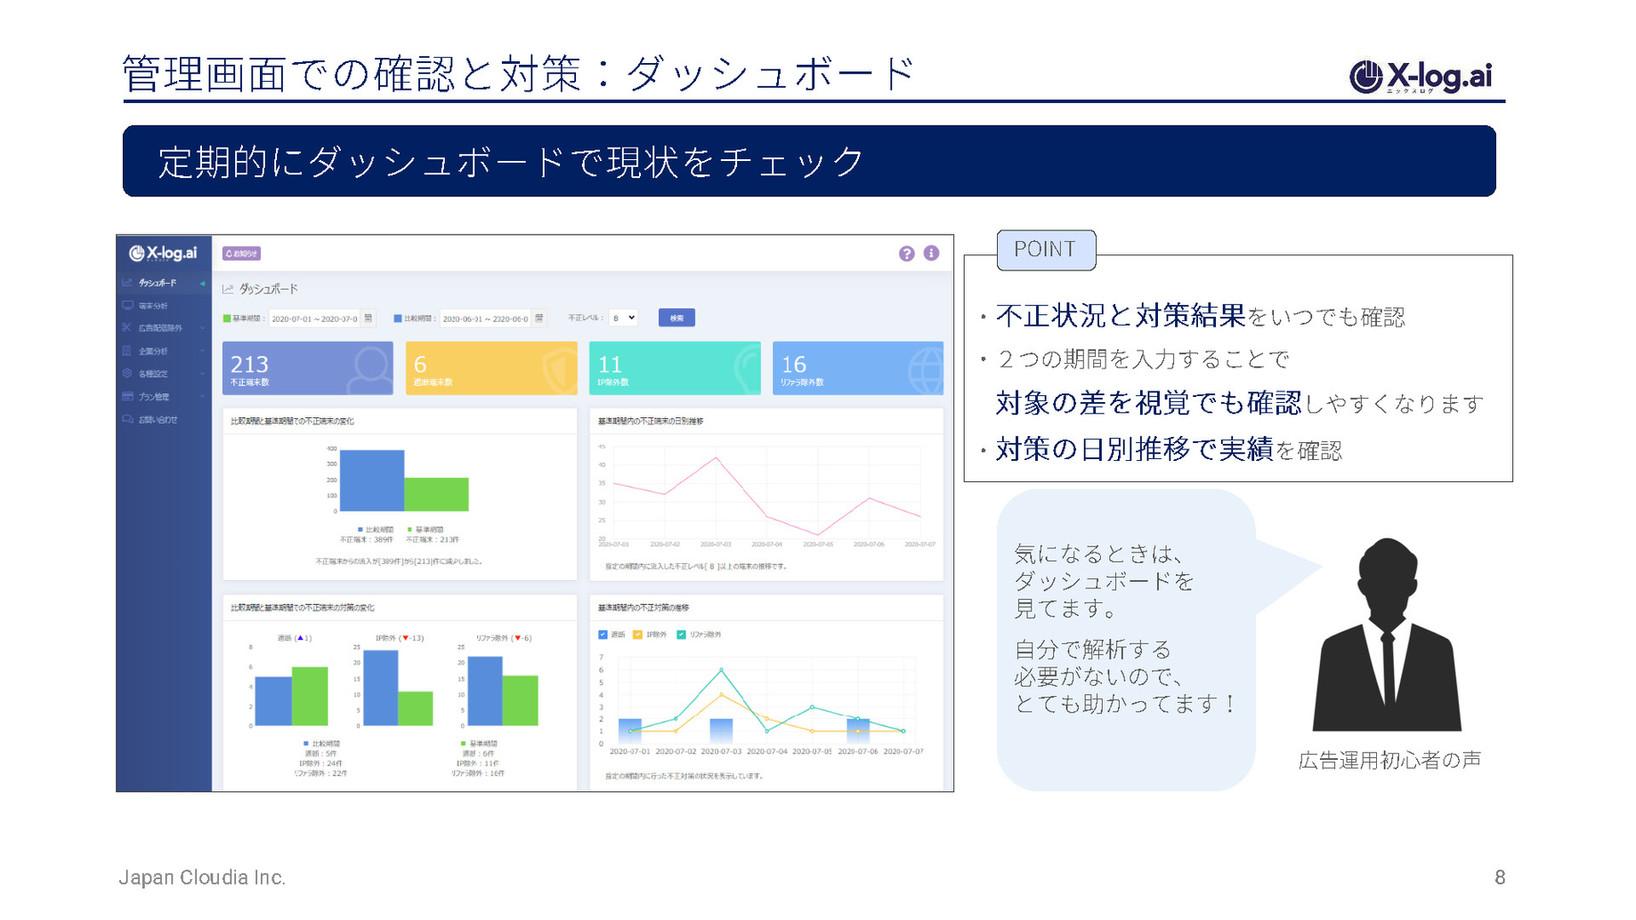 X-log.aiご案内資料_ページ_08.jpg